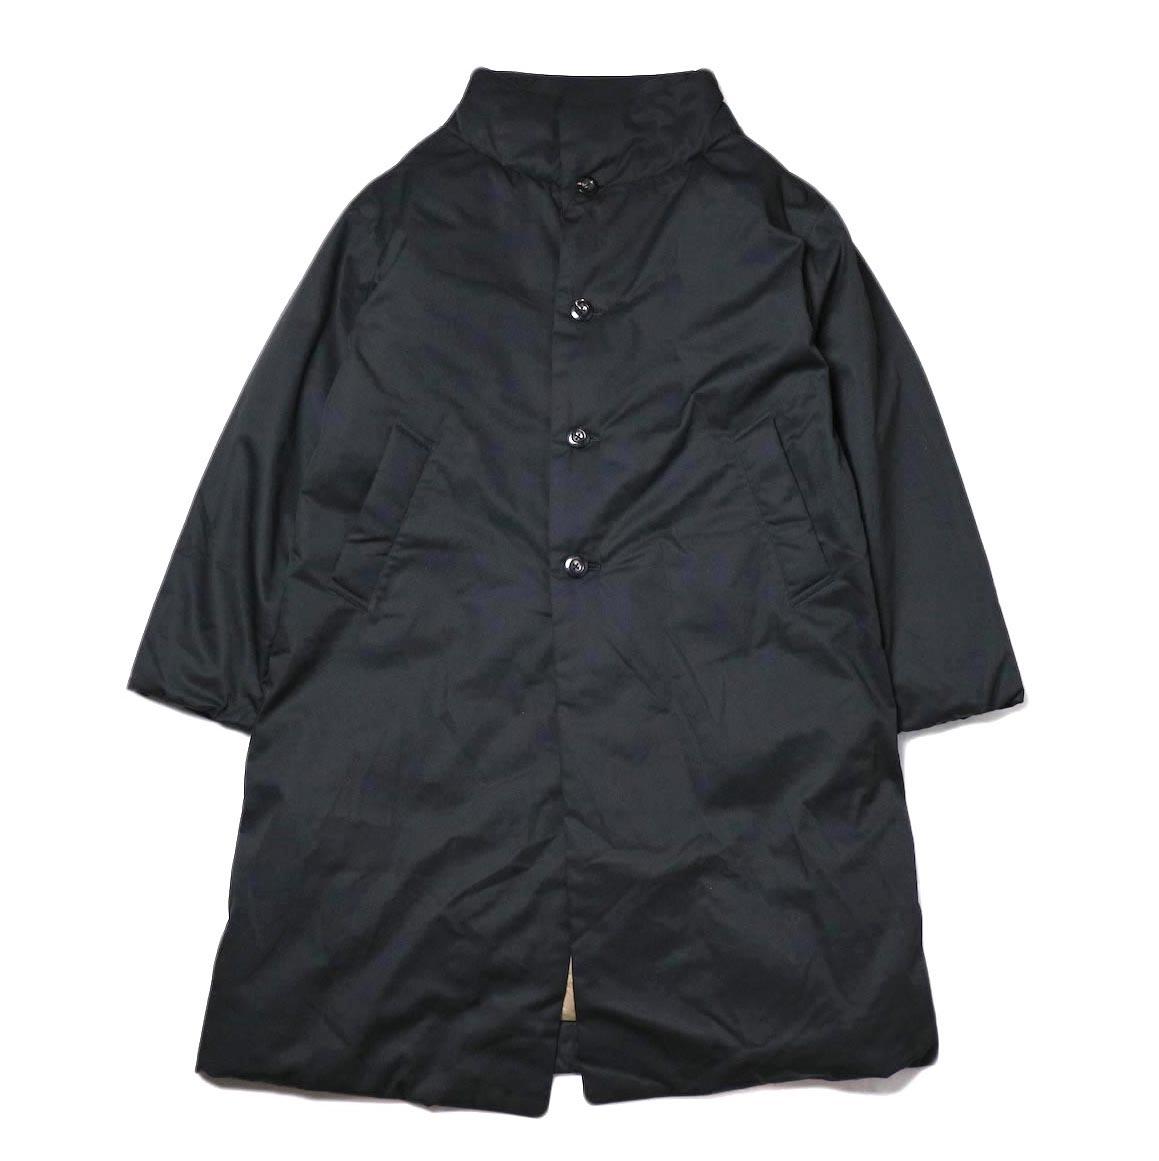 THE LOFT LABO / NARDY (Black) 正面